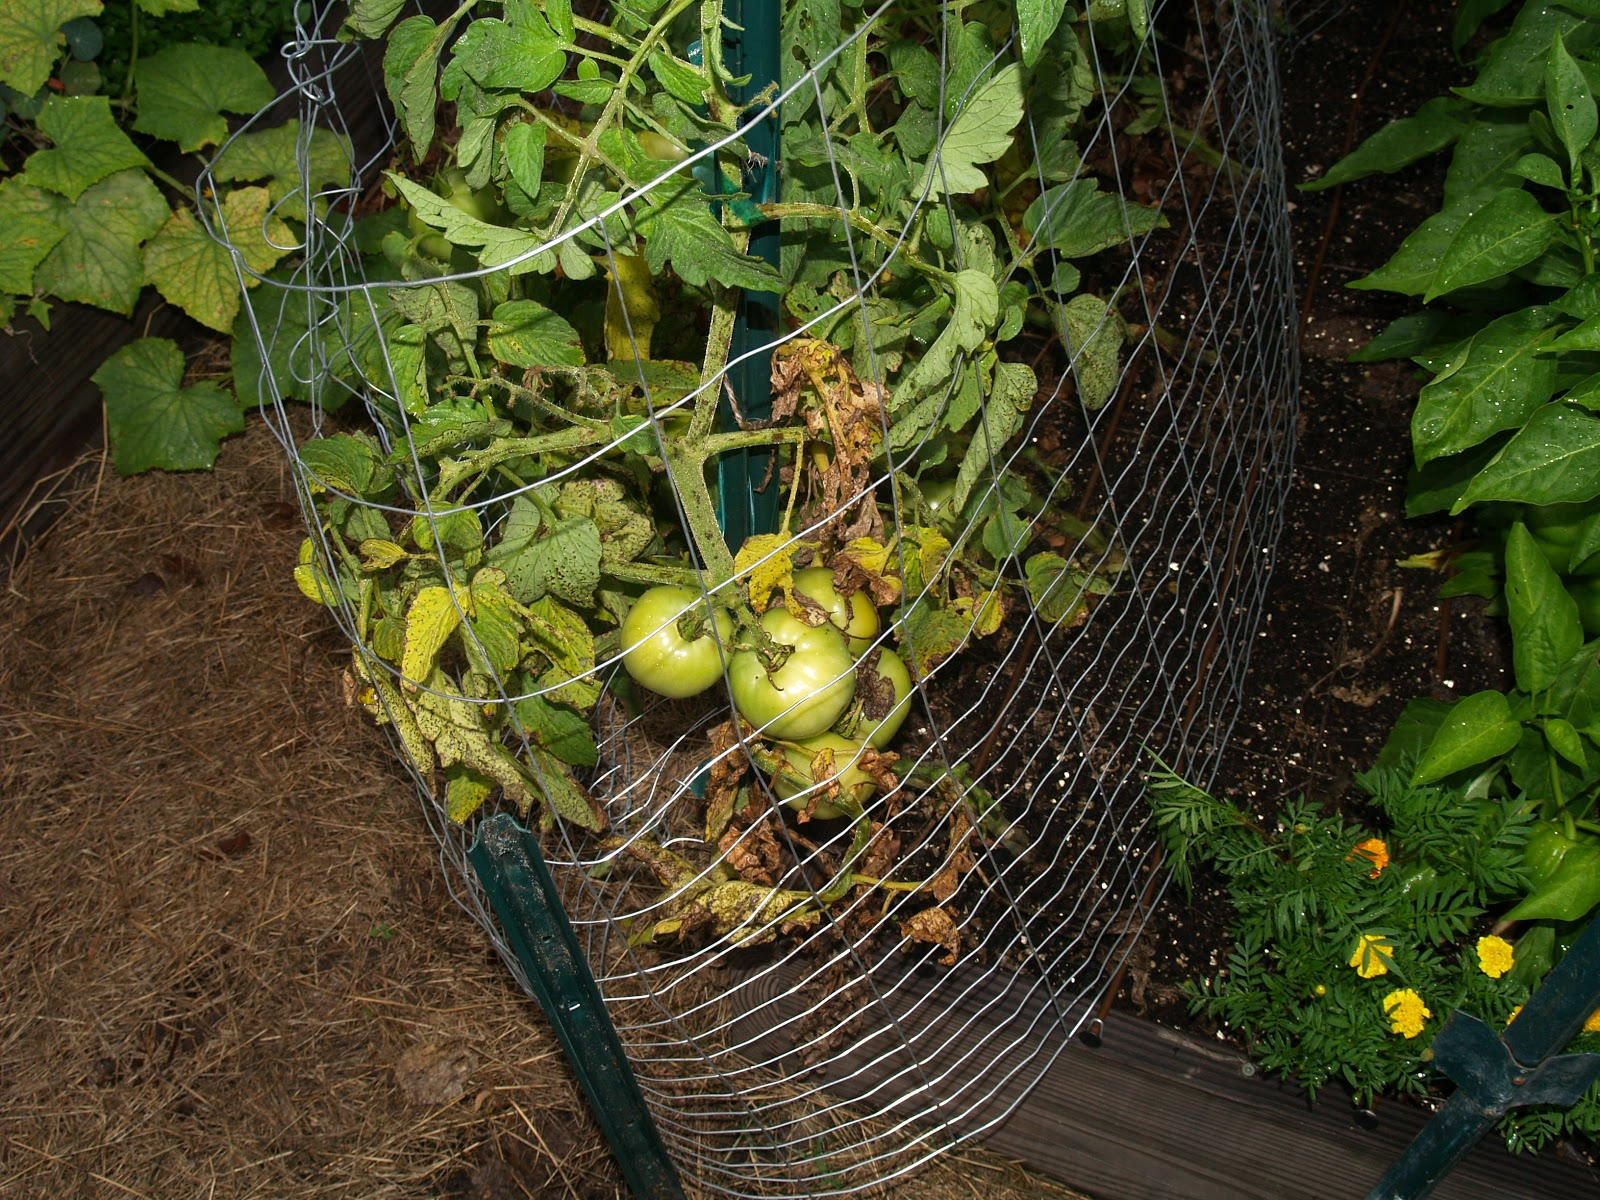 gardening in winter garden: attack of the rats